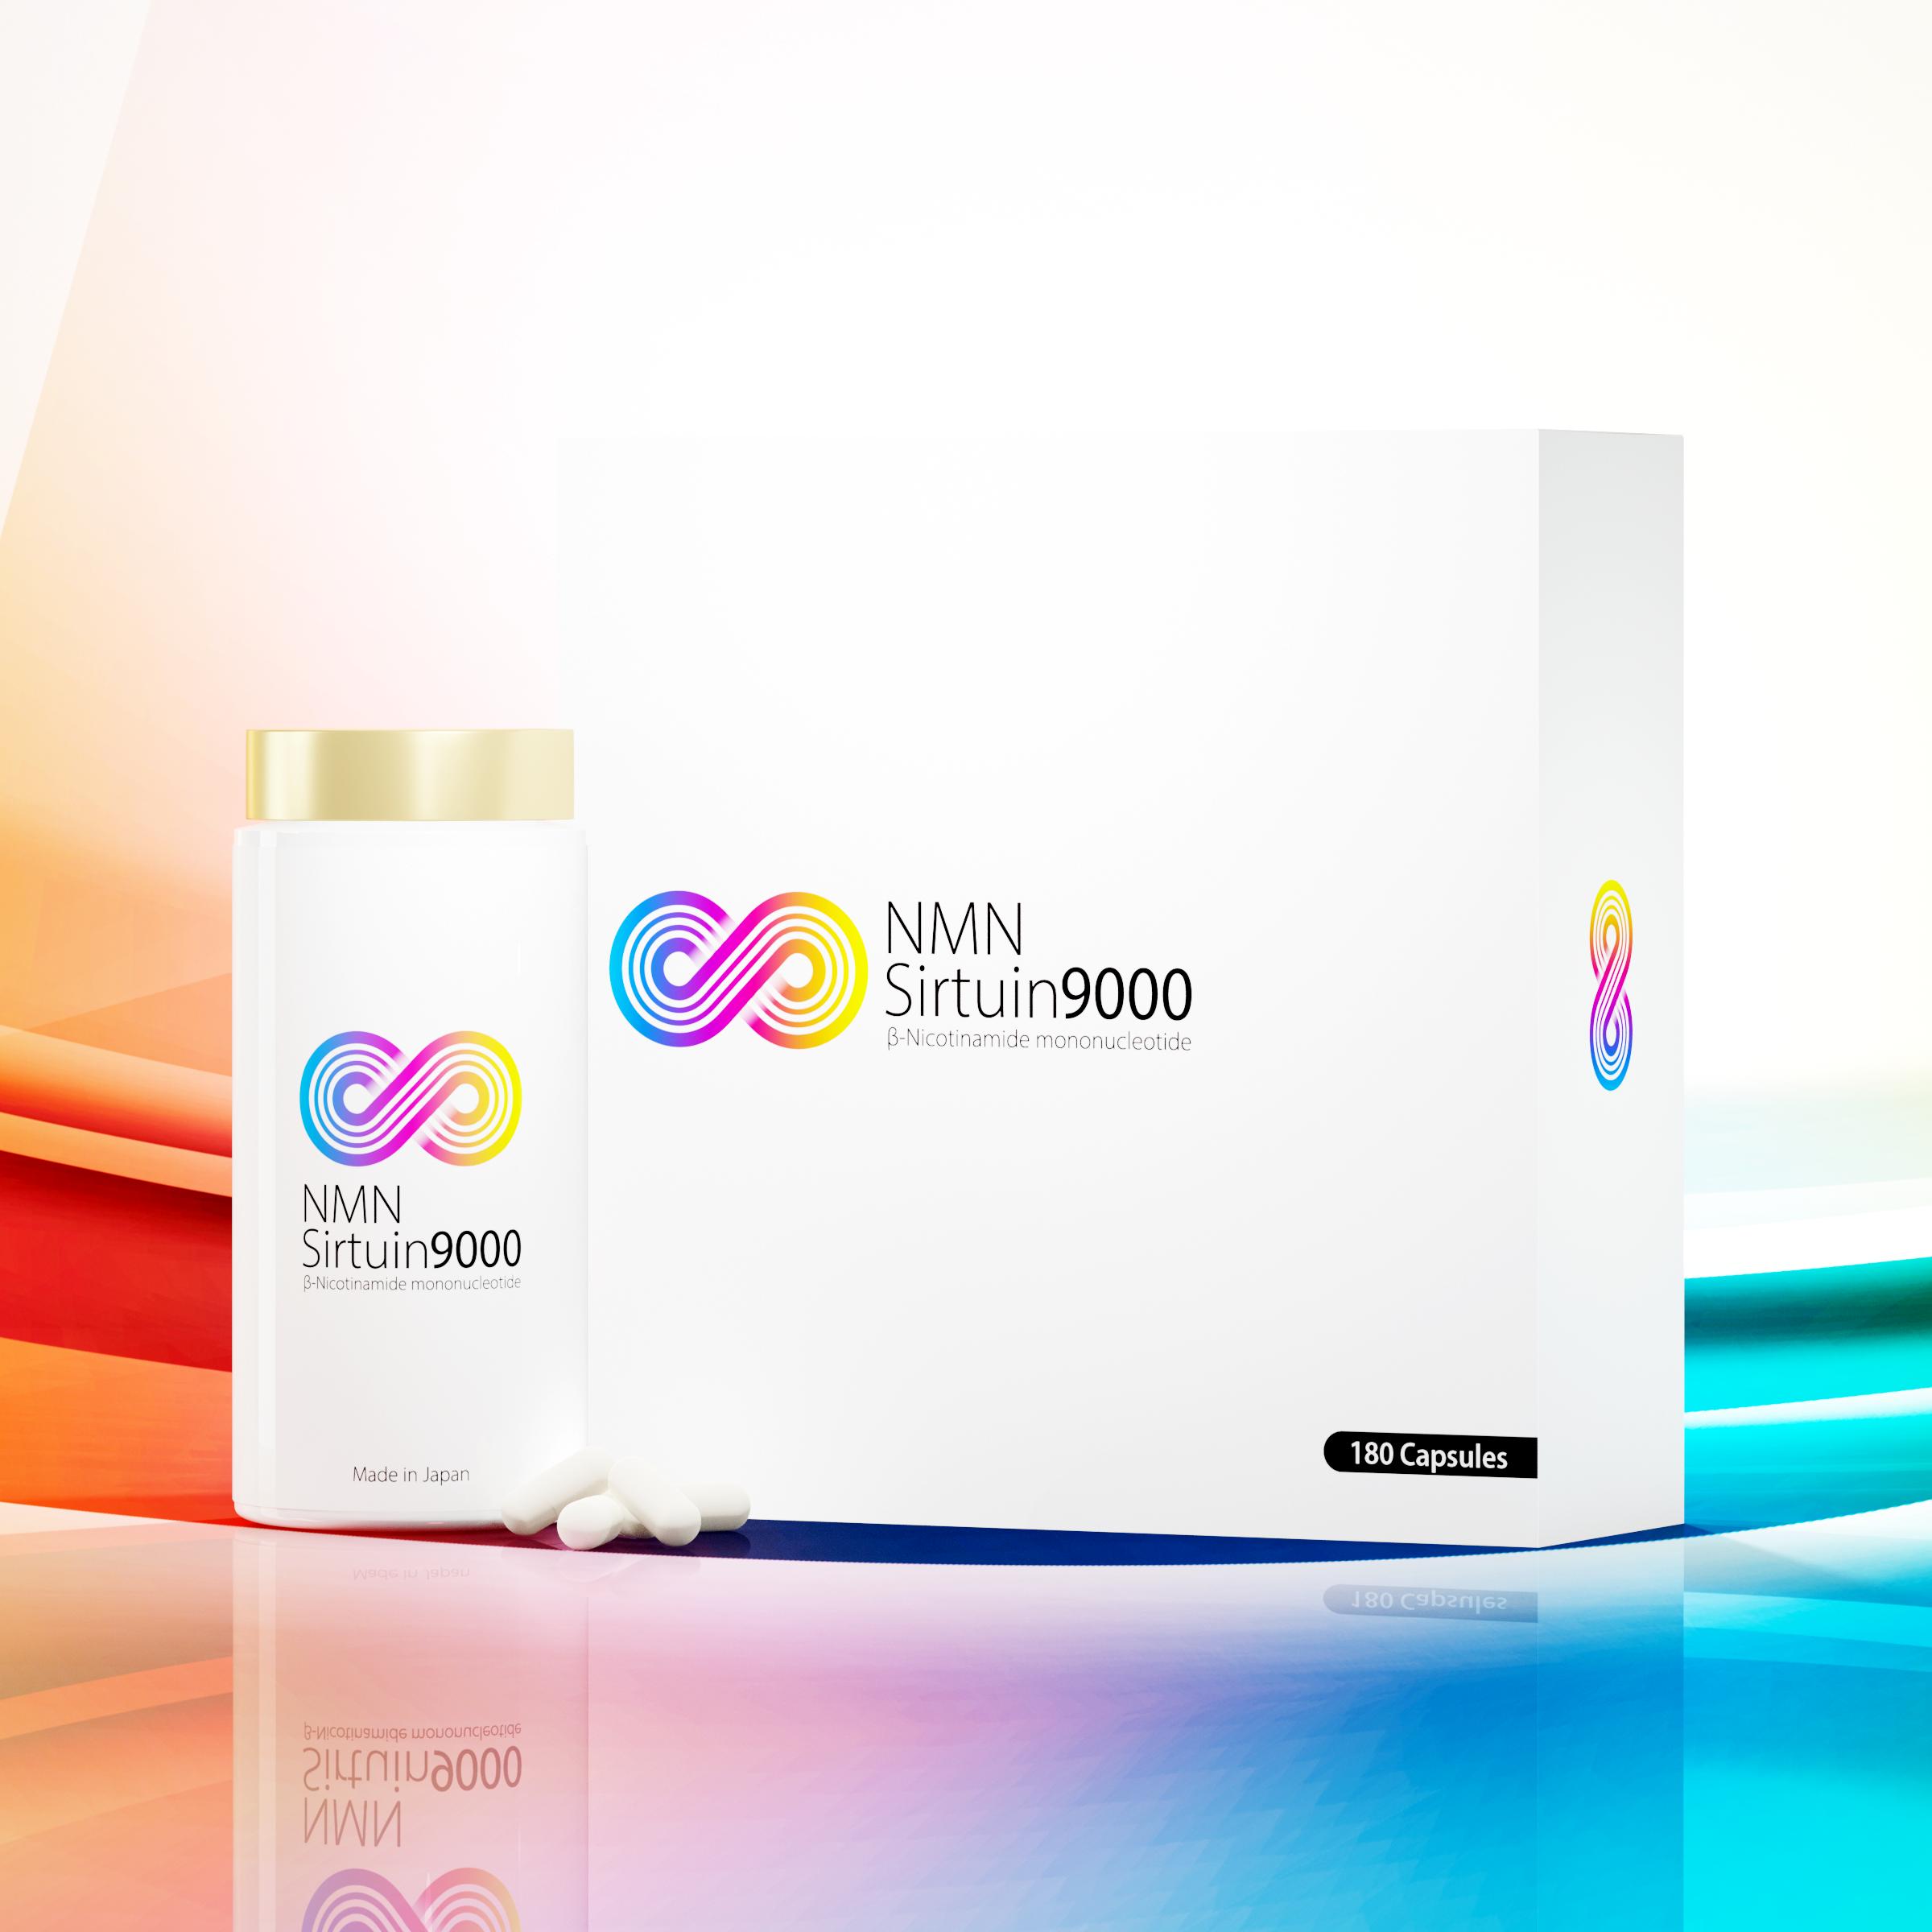 NMN Sirtuin9000 C